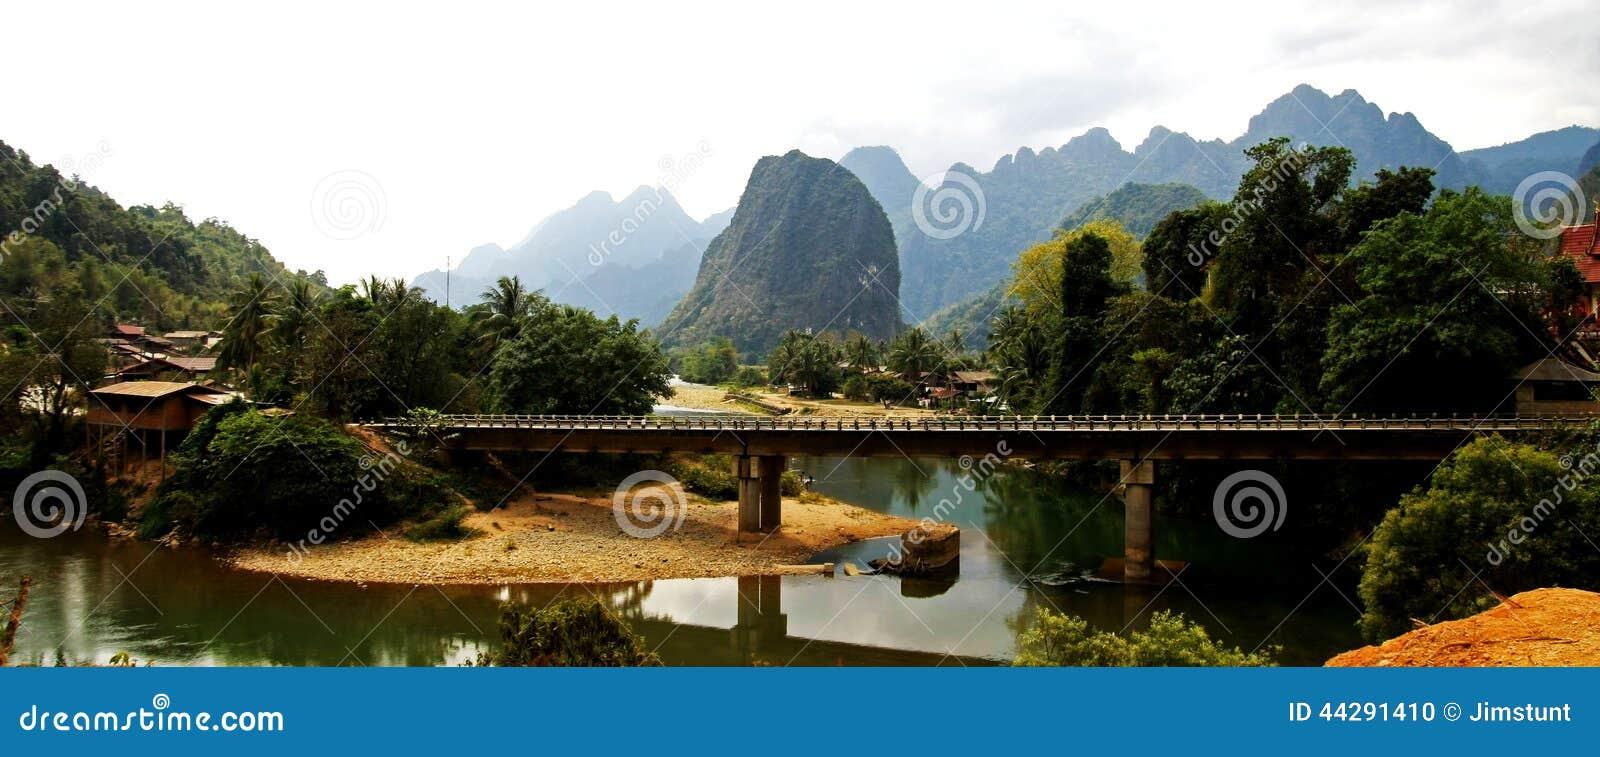 Ban That Laos  City pictures : Ban Pha Tang Bridge Stock Photo Image: 44291410